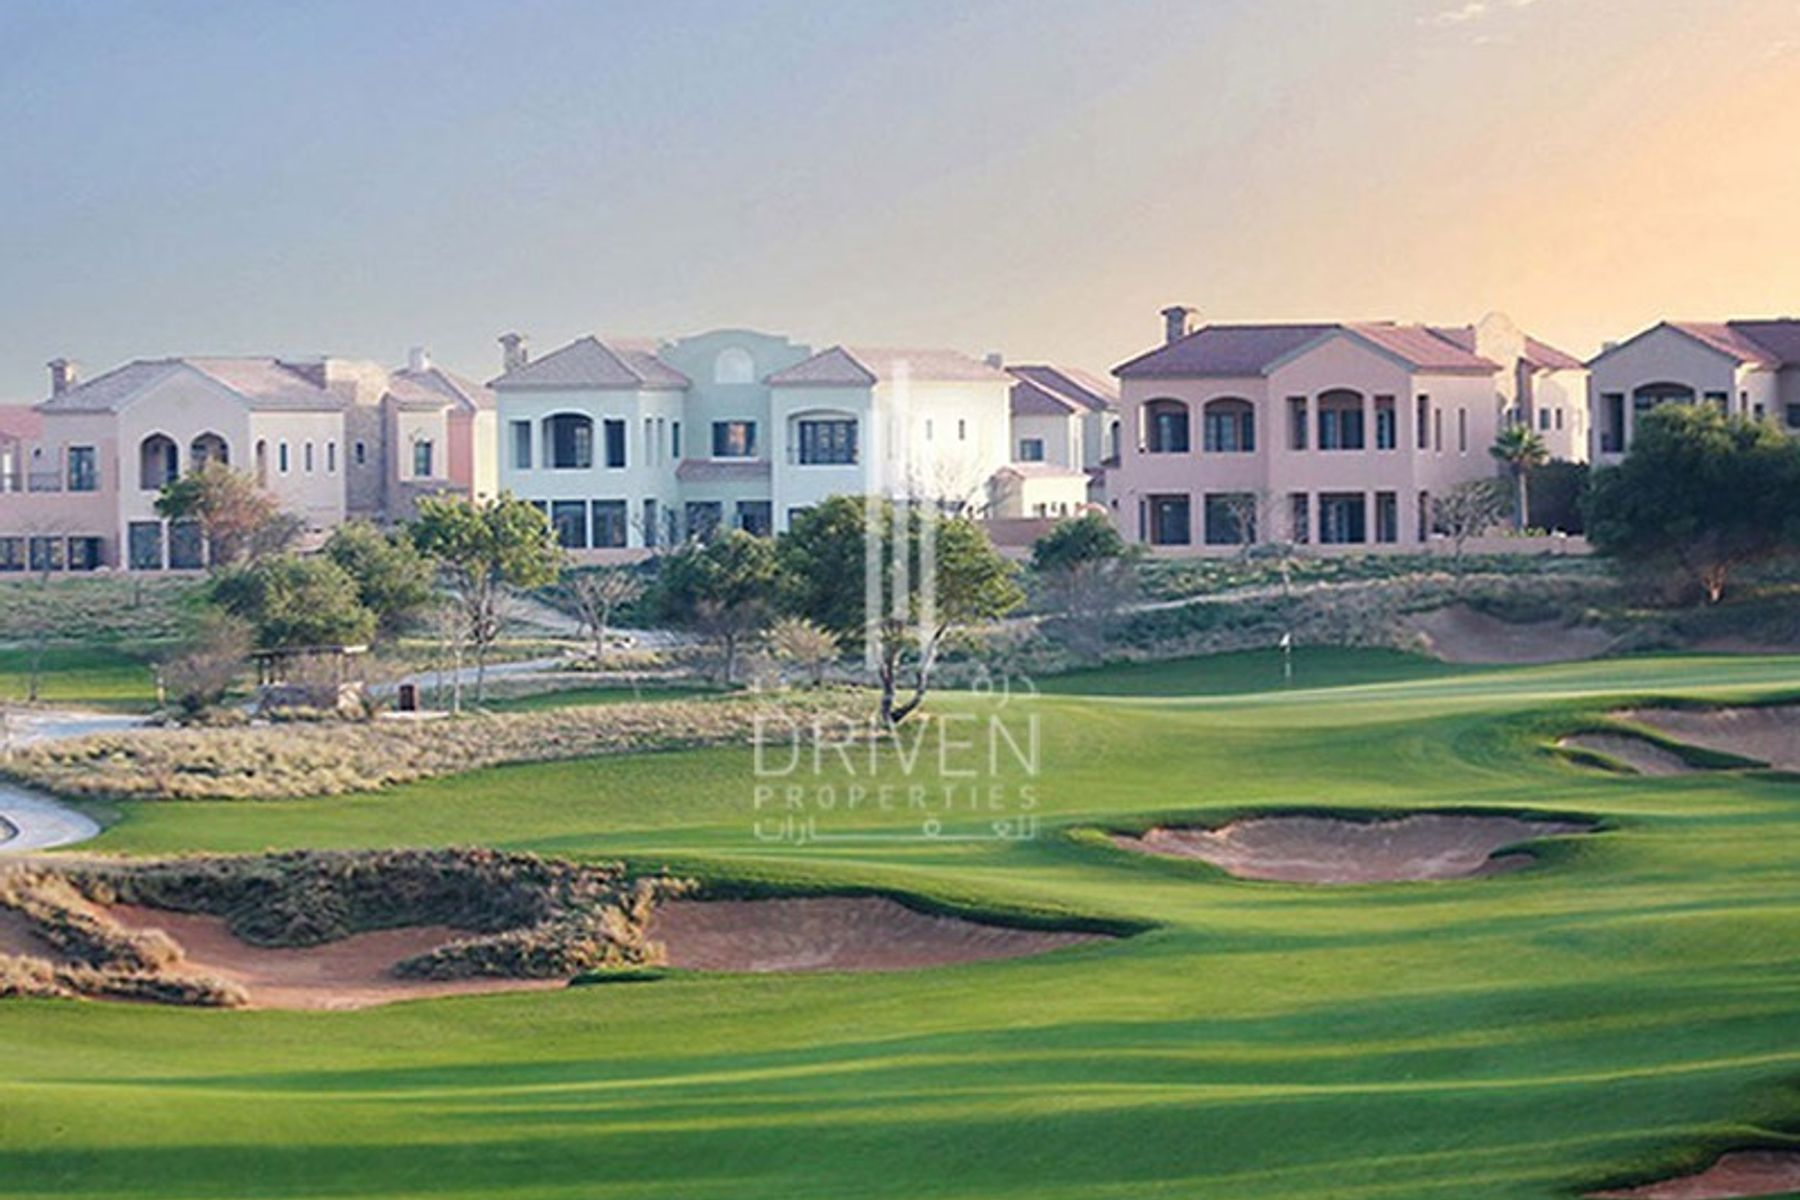 Villa for Sale in Golf Links - Dubai South (Dubai World Central)